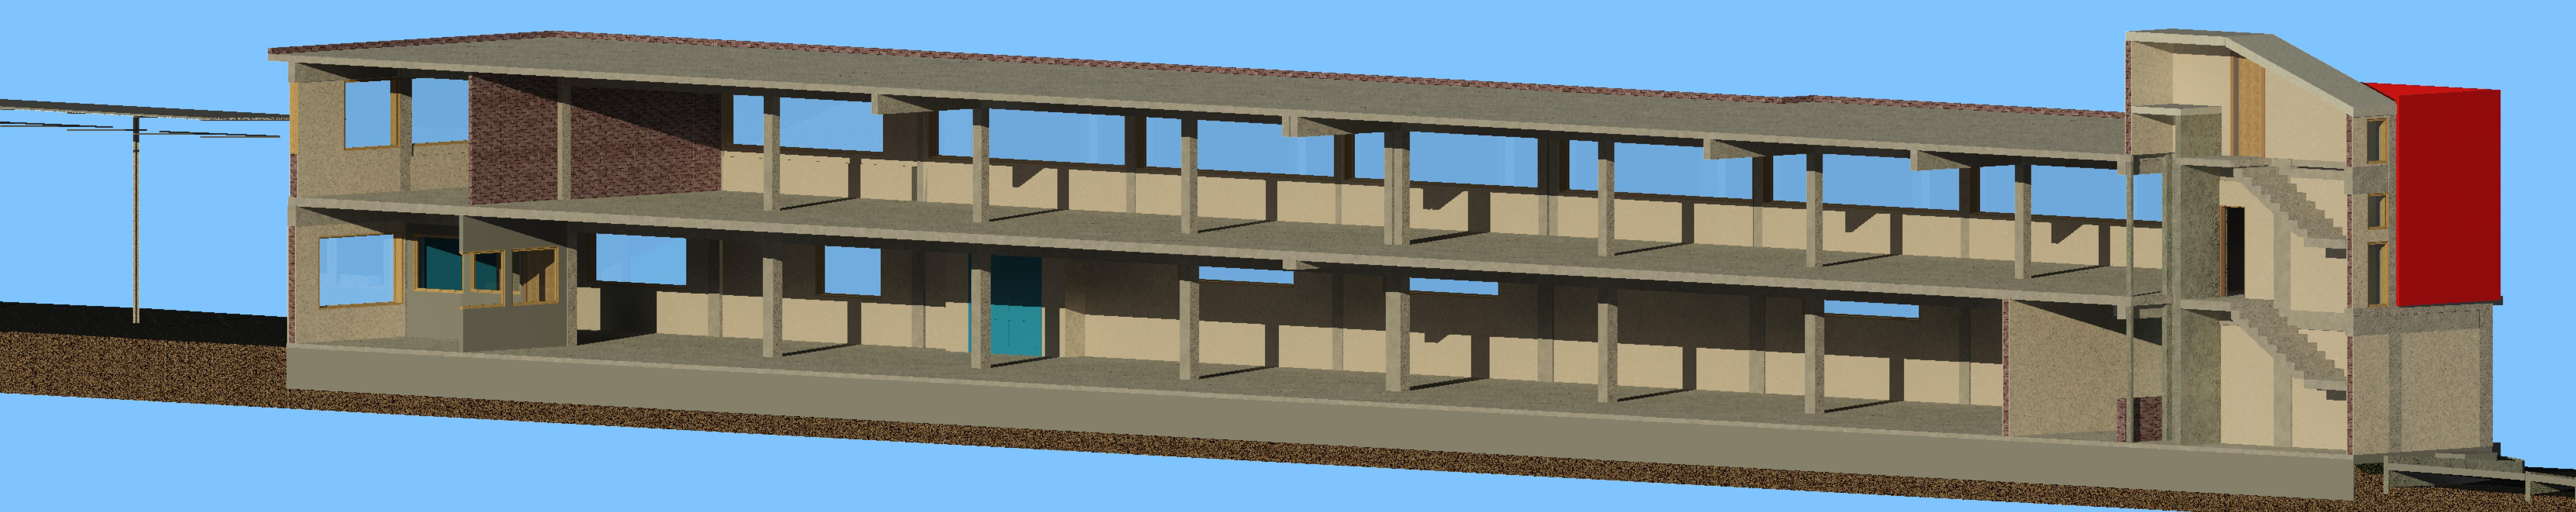 3D surveying & modeling